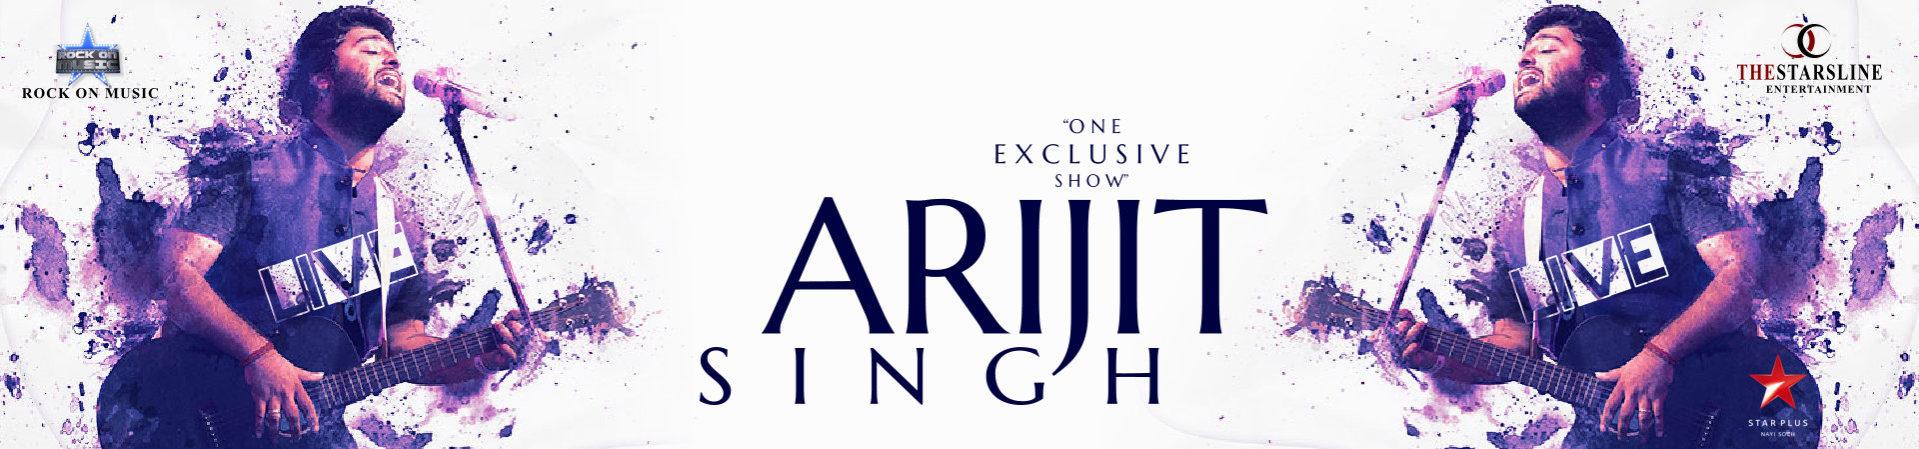 Arijit Singh 1920 x 450 Ticketpoint